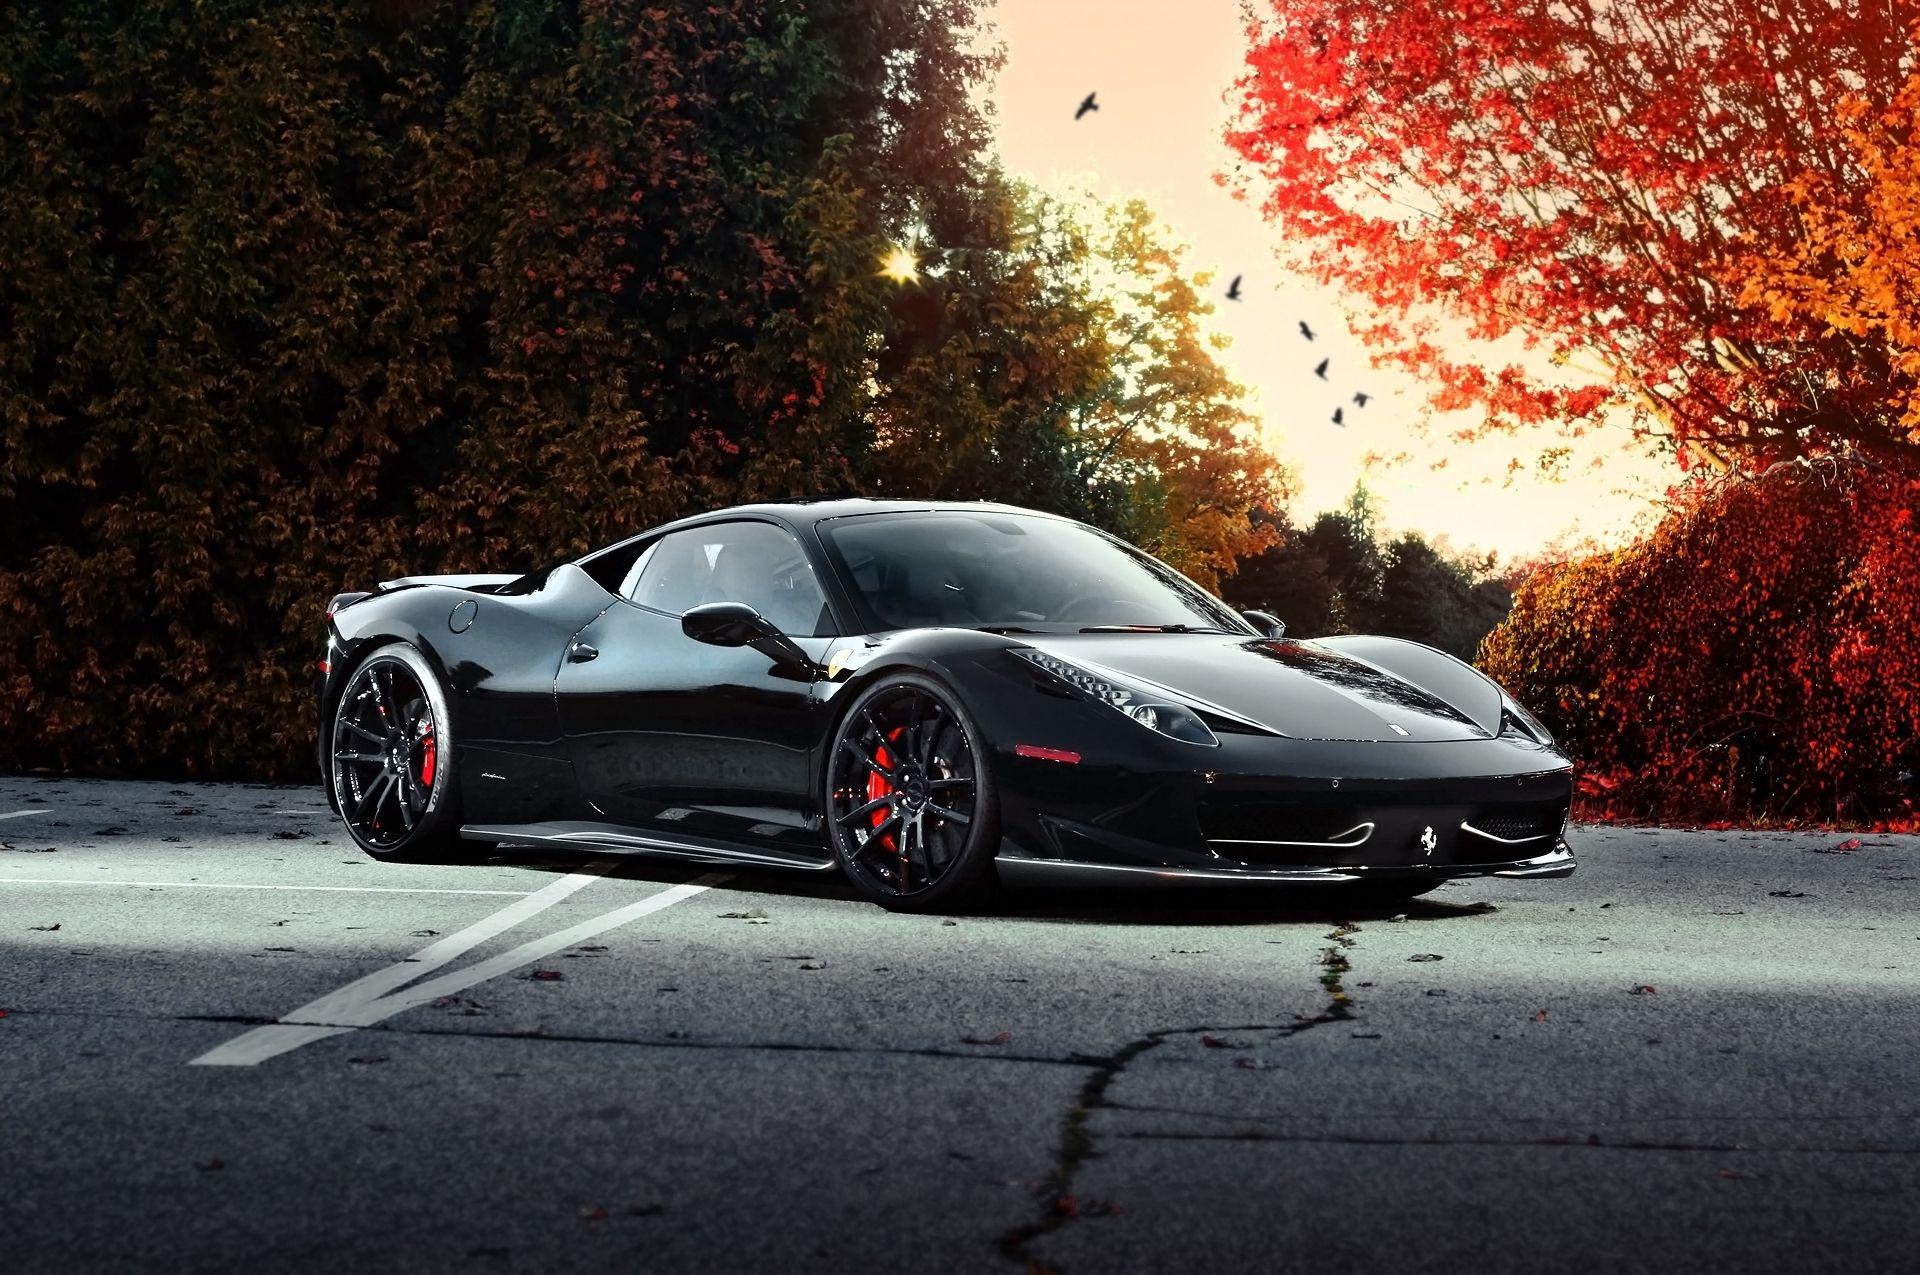 Обои Феррари, Ferrari 458 italia, улица. Автомобили foto 15